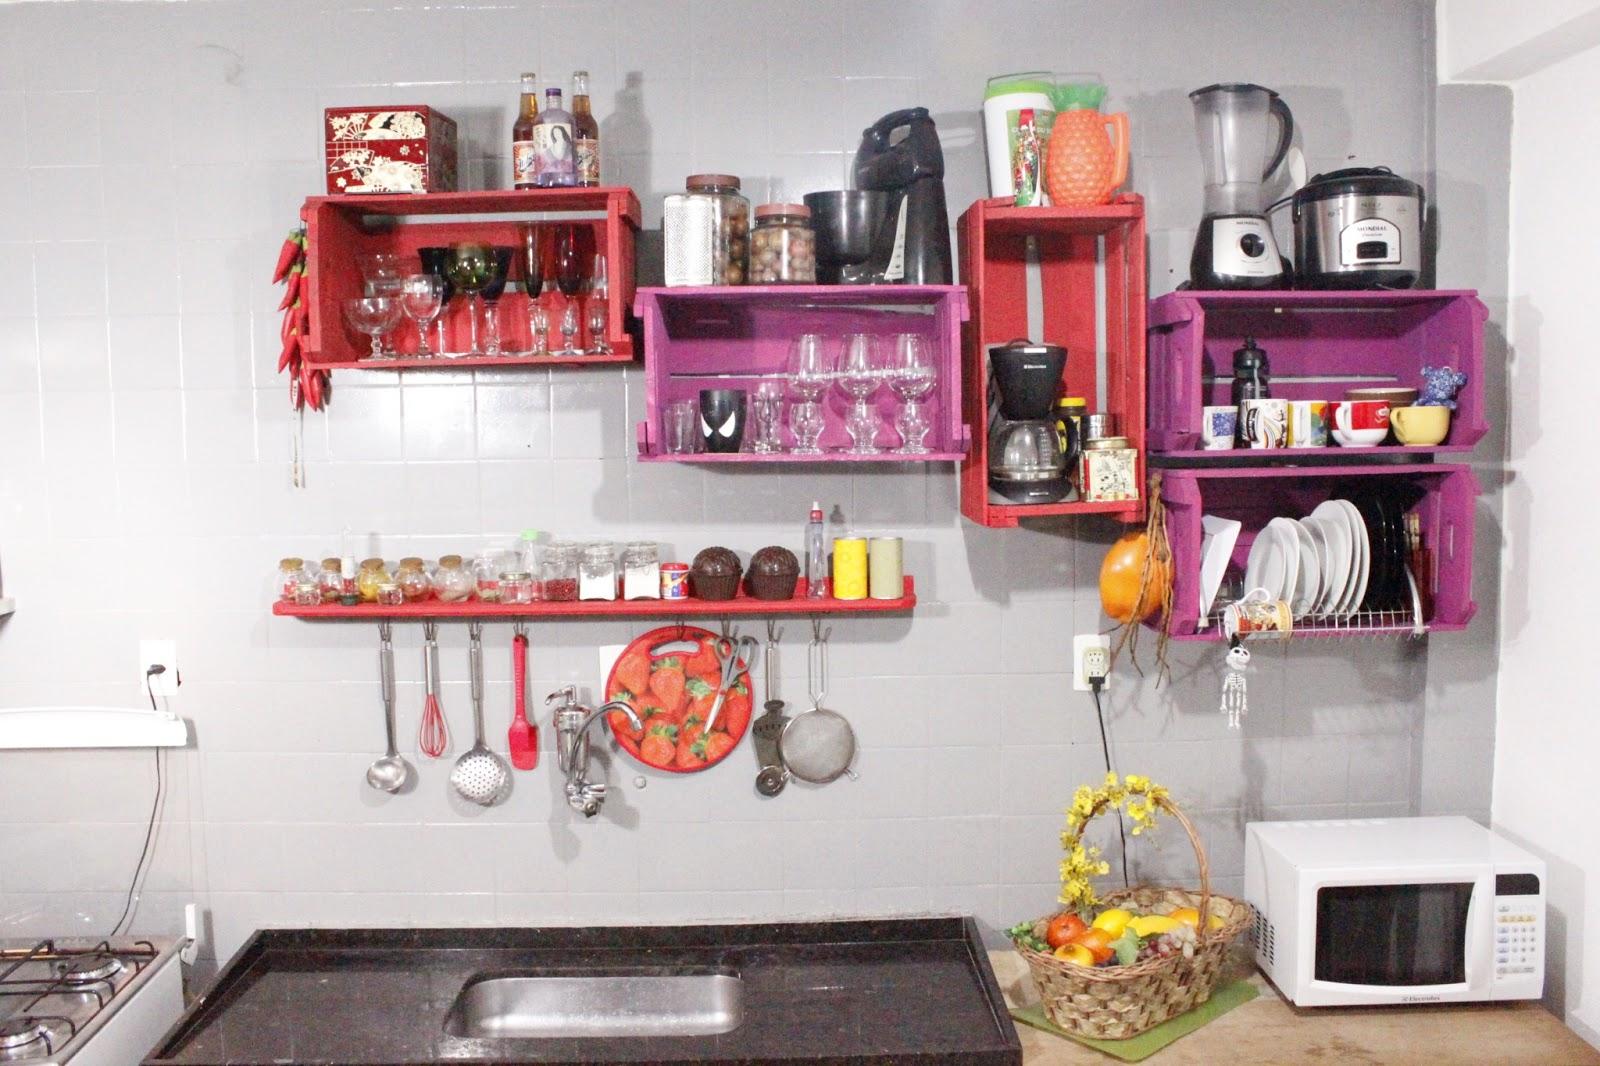 decoracao na cozinha:Videos De Como Decorar Casas